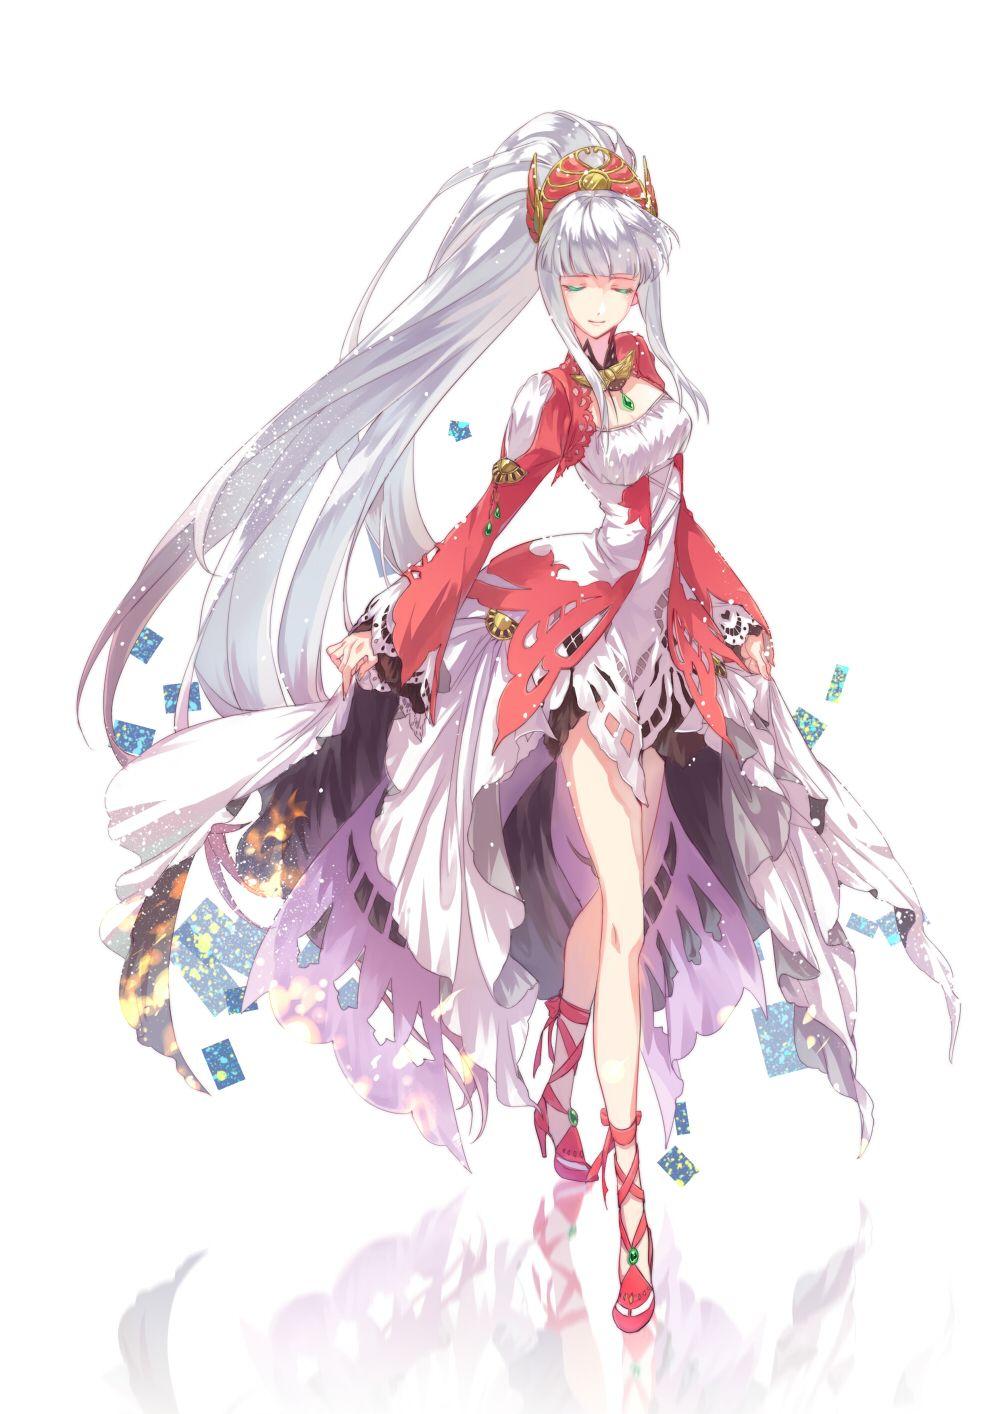 Character Design Zerochan : Lailah tales of zestiria zerochan anime